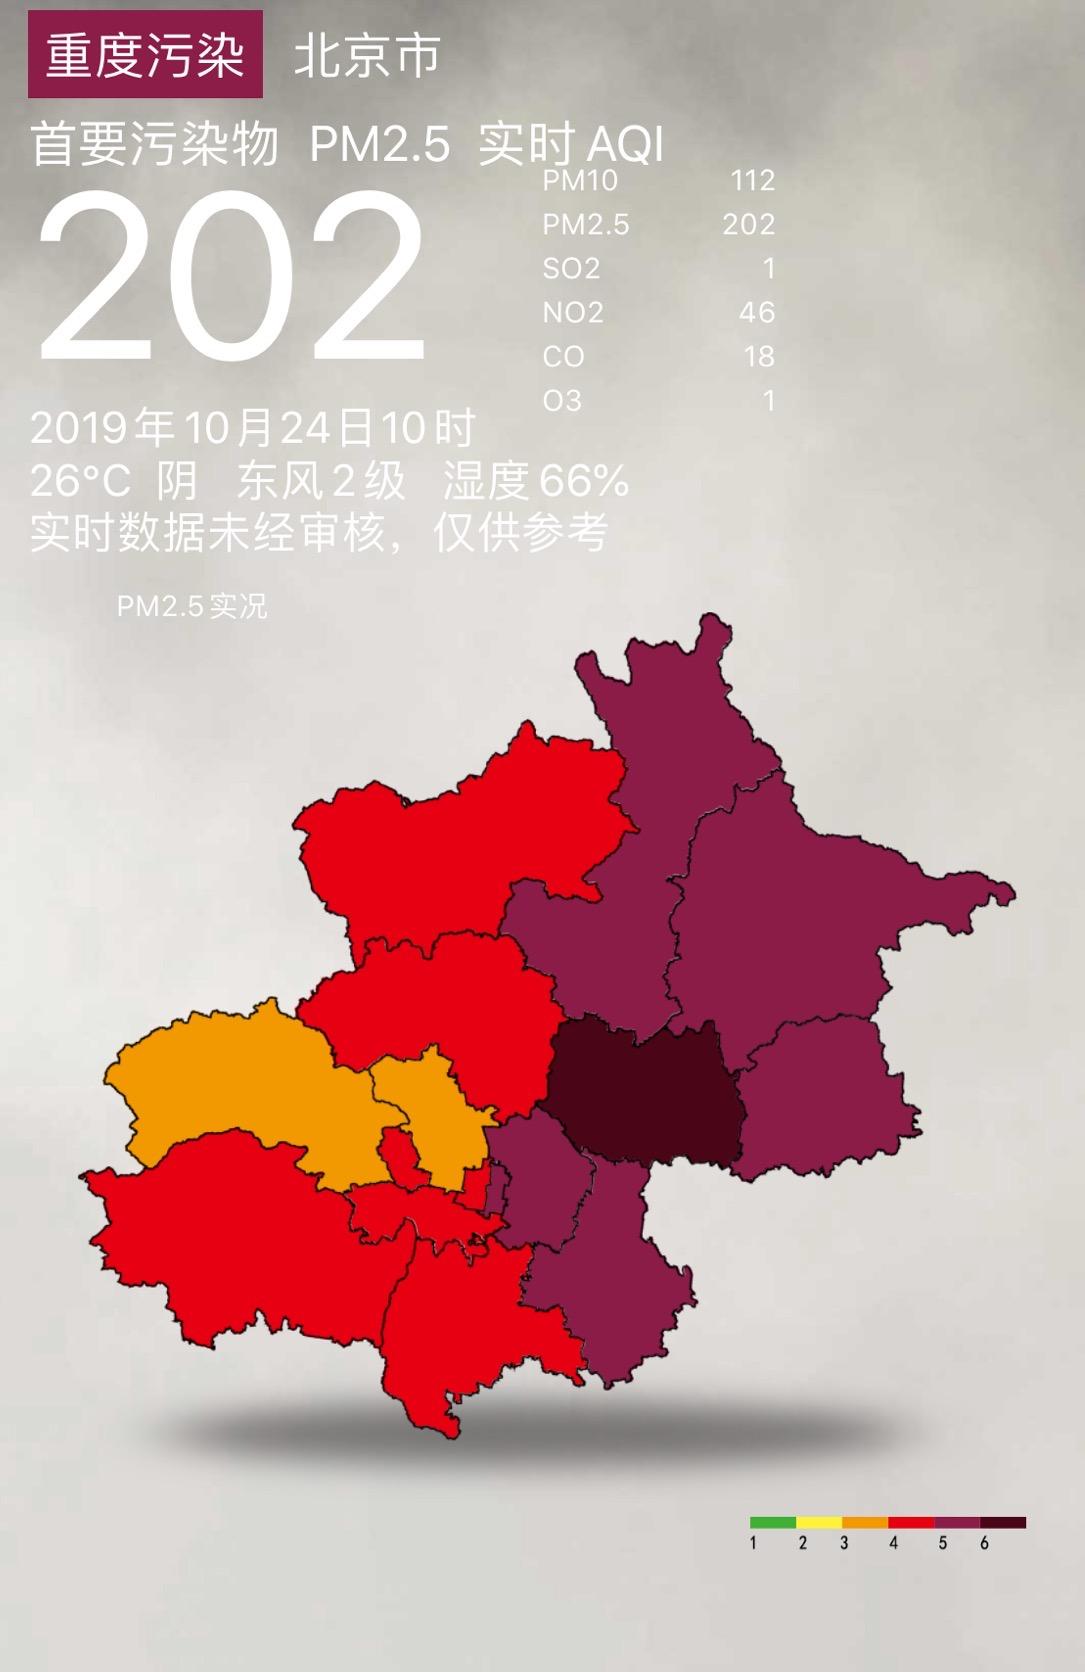 bet366体育投注下载 深圳已铺设超1.3万个5G基站 将率先实现5G信号全覆盖